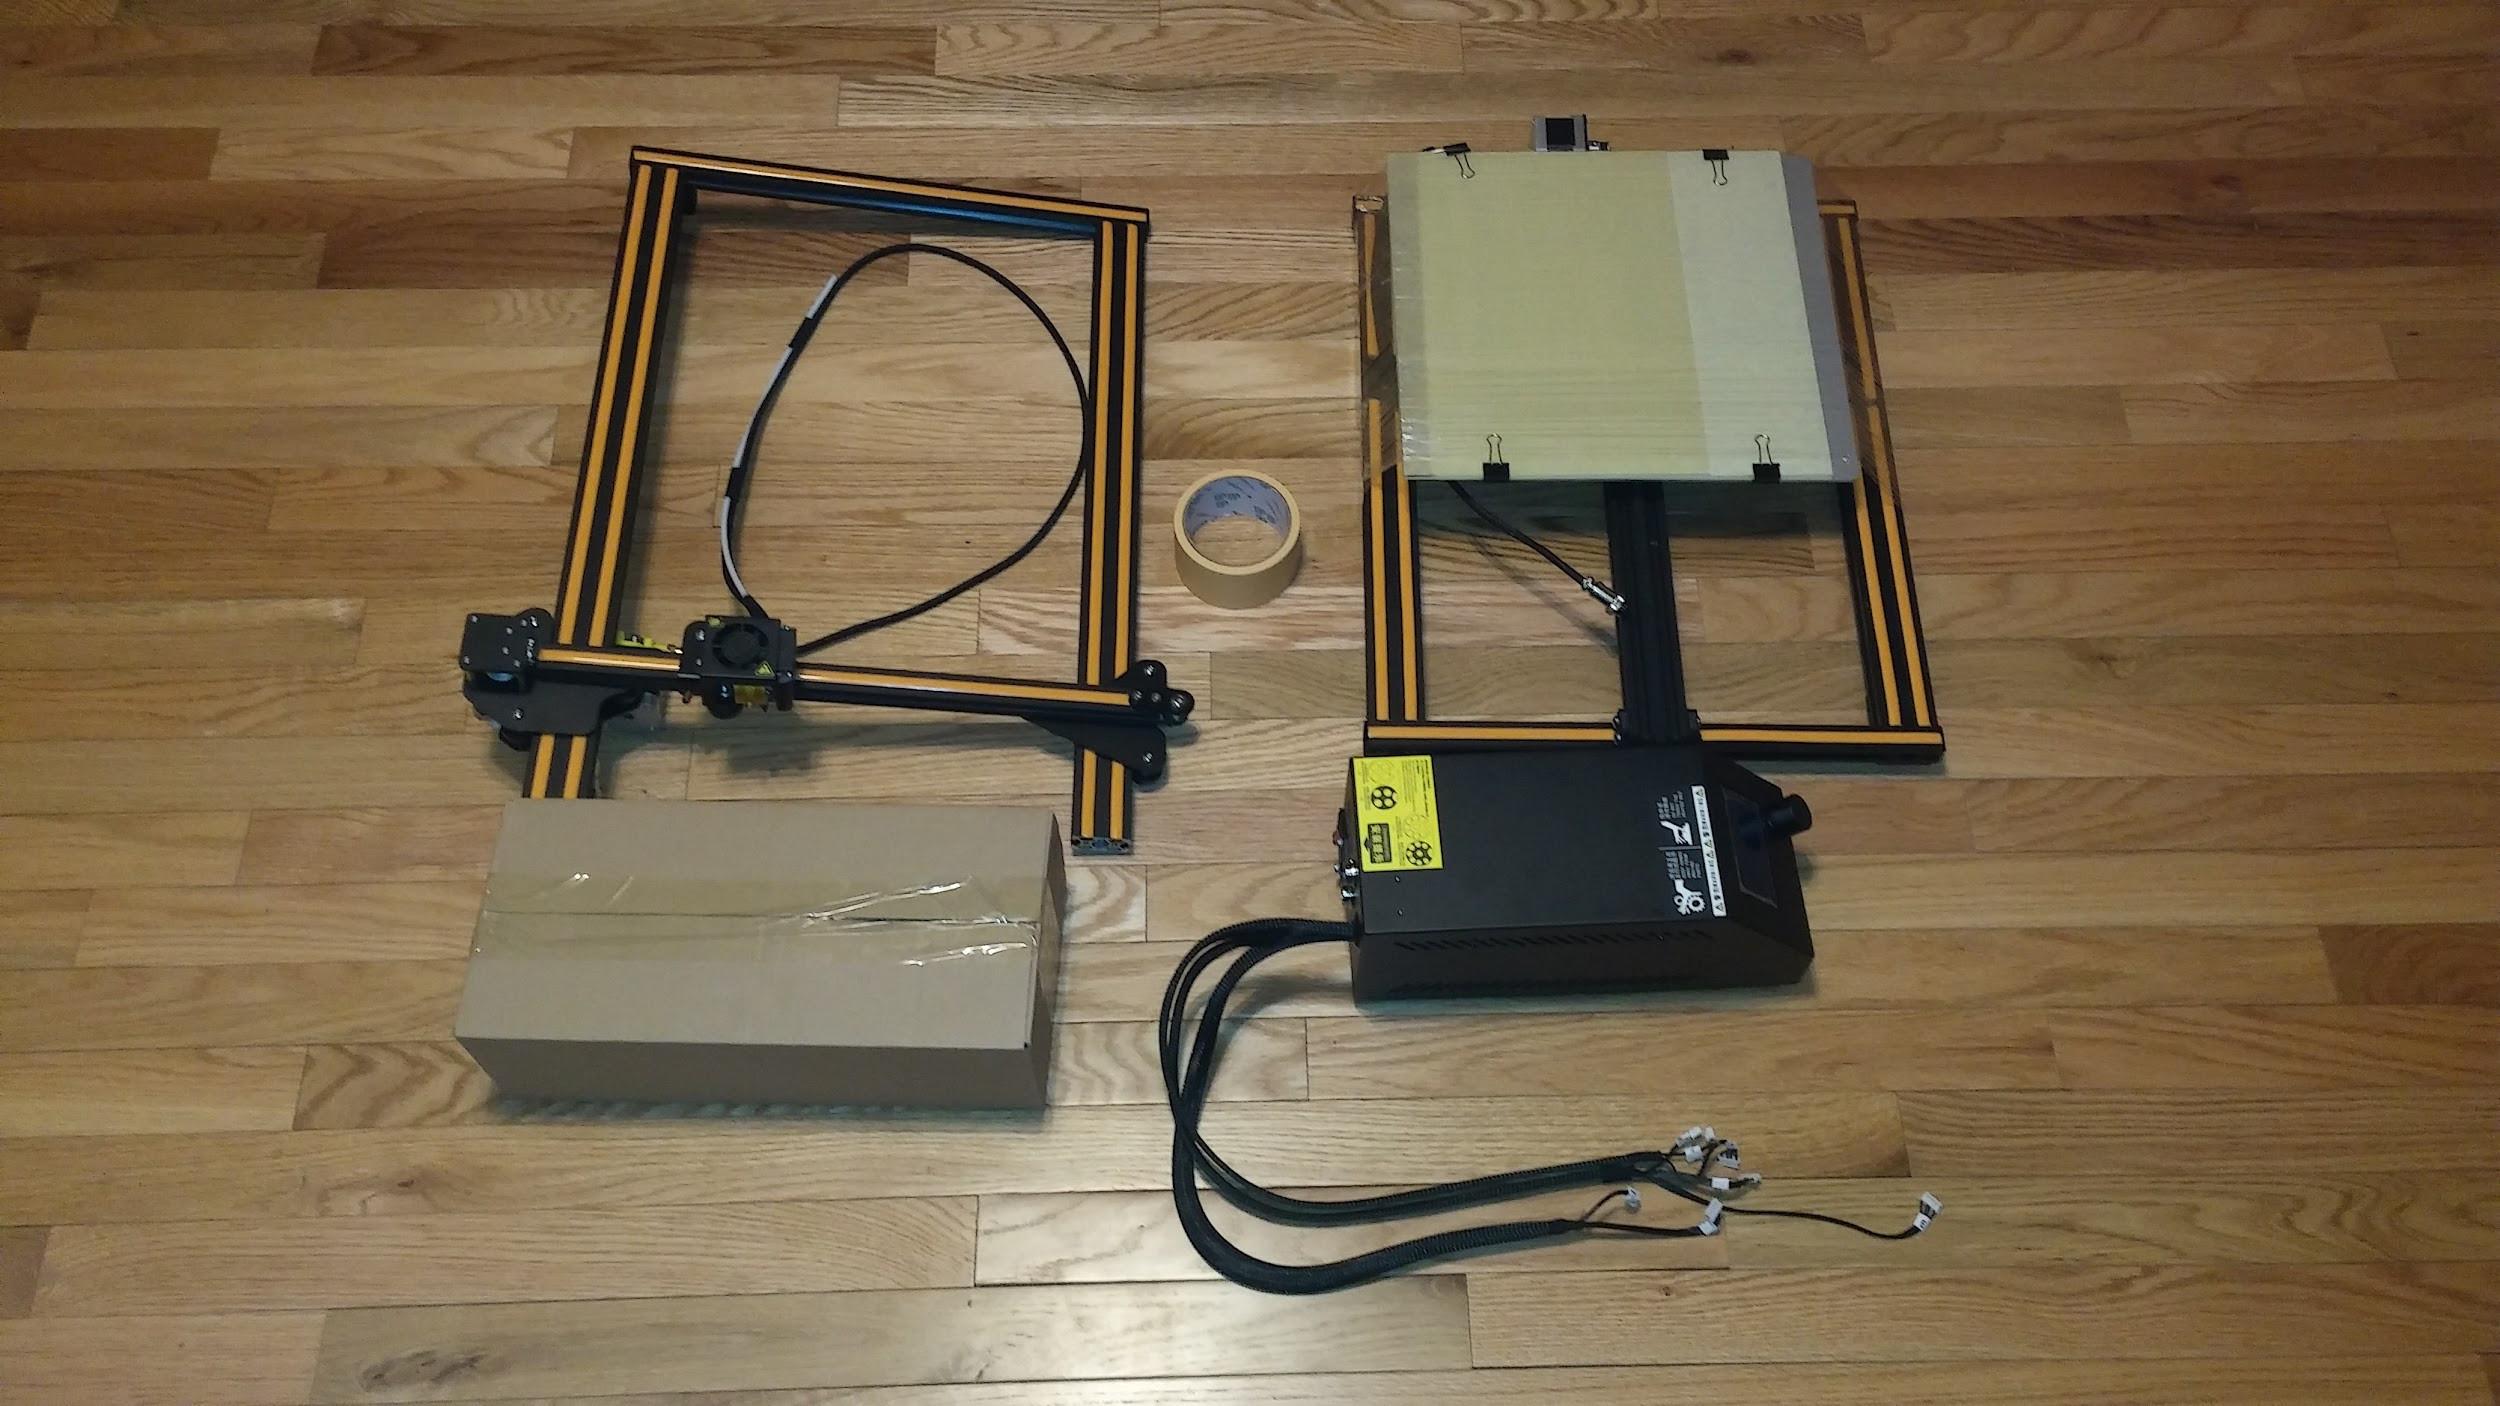 Creality CR-10 3D Printer Review - Part 1: Unboxing, Setup